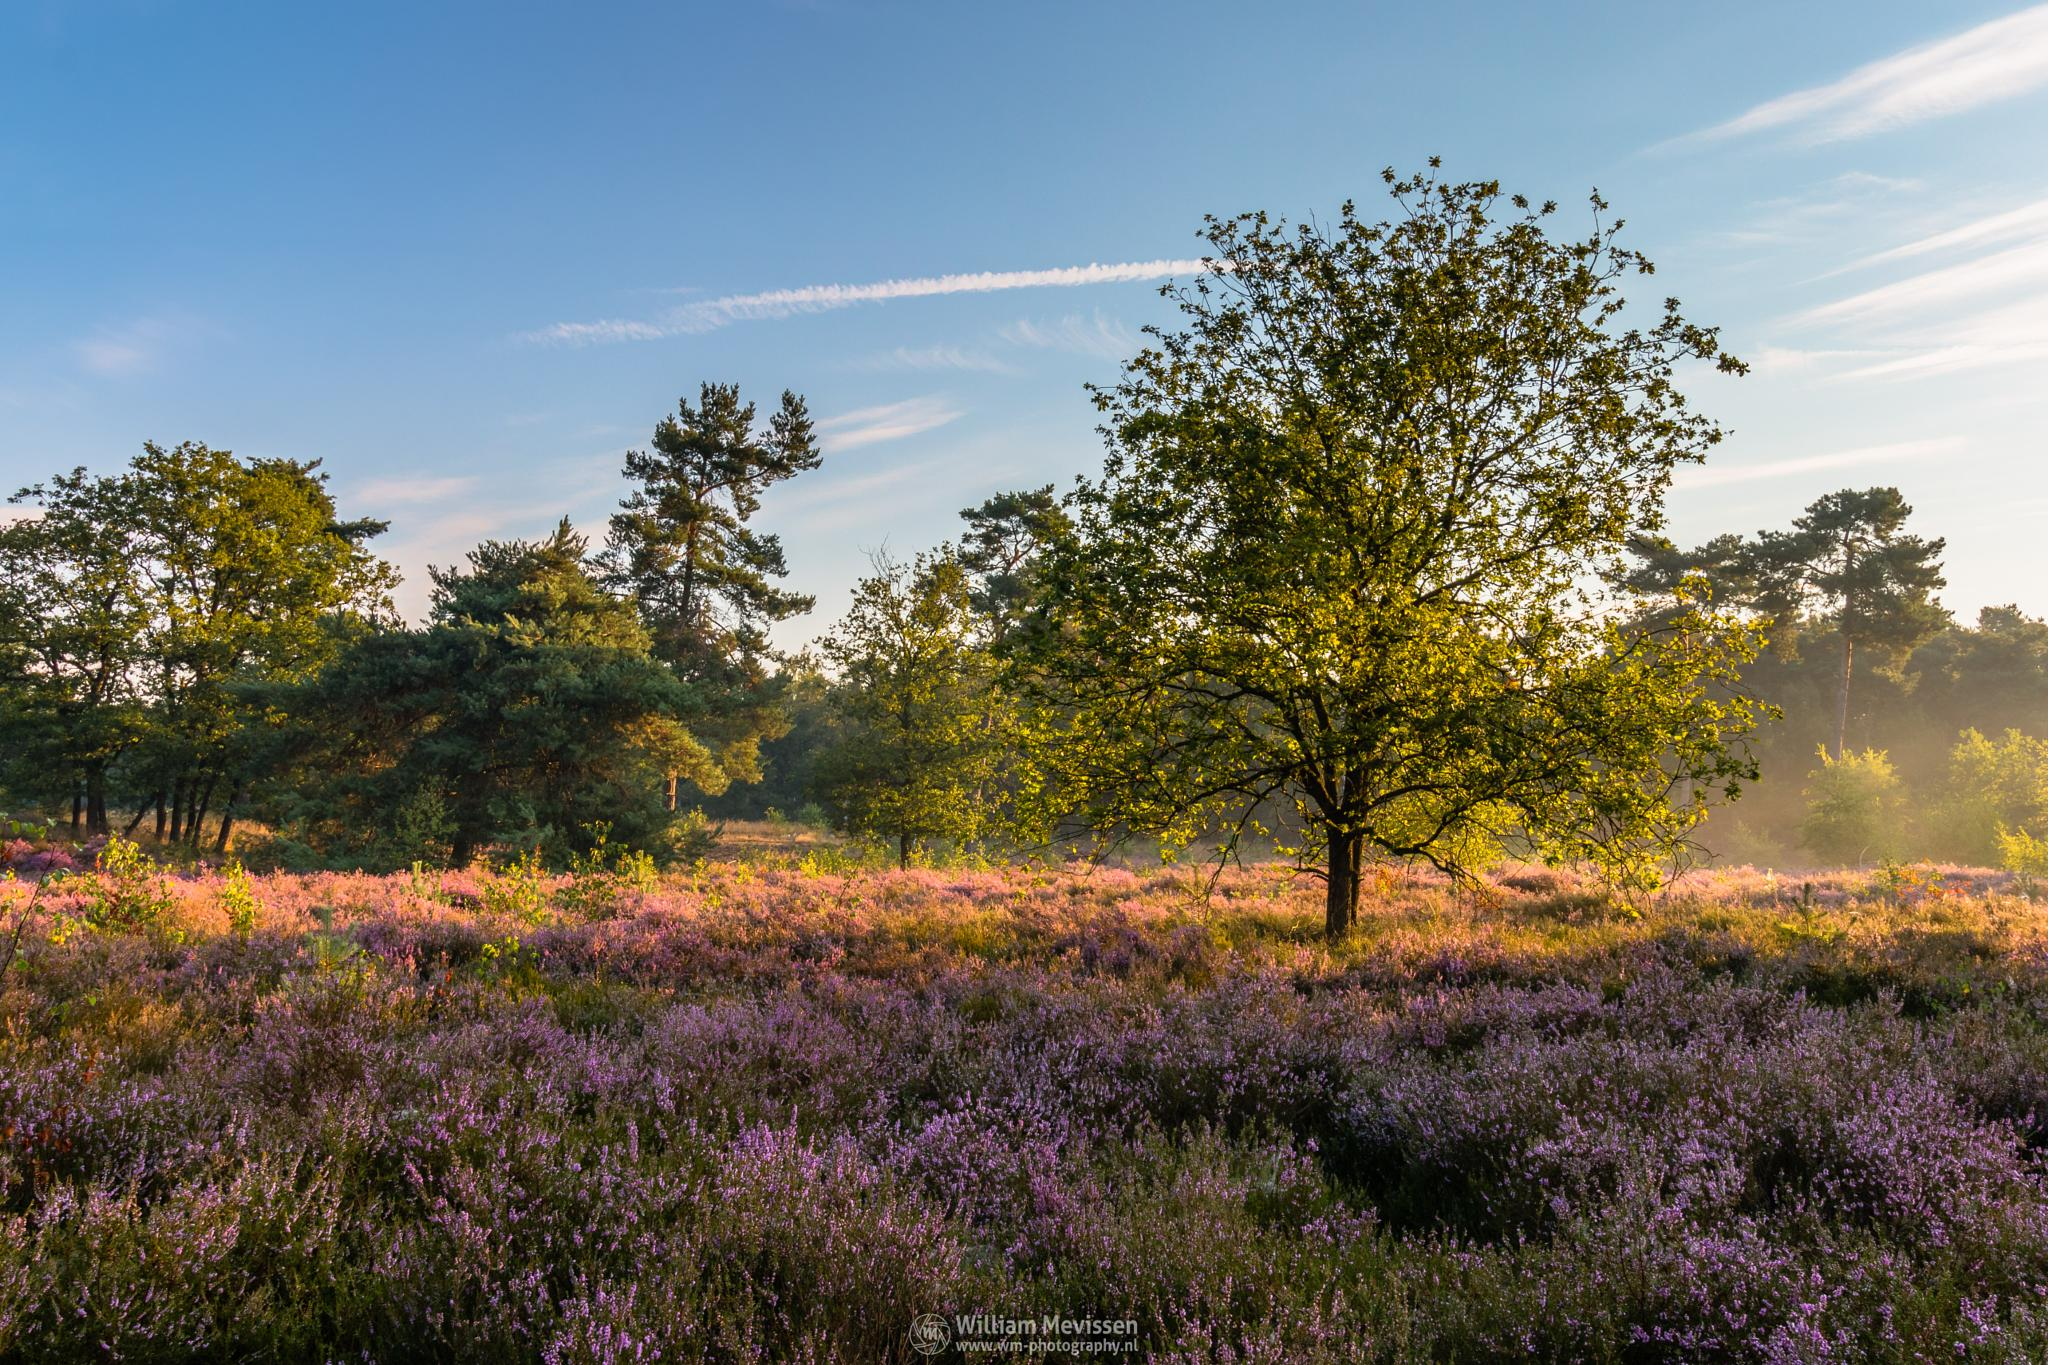 Sunrise Tree by William Mevissen